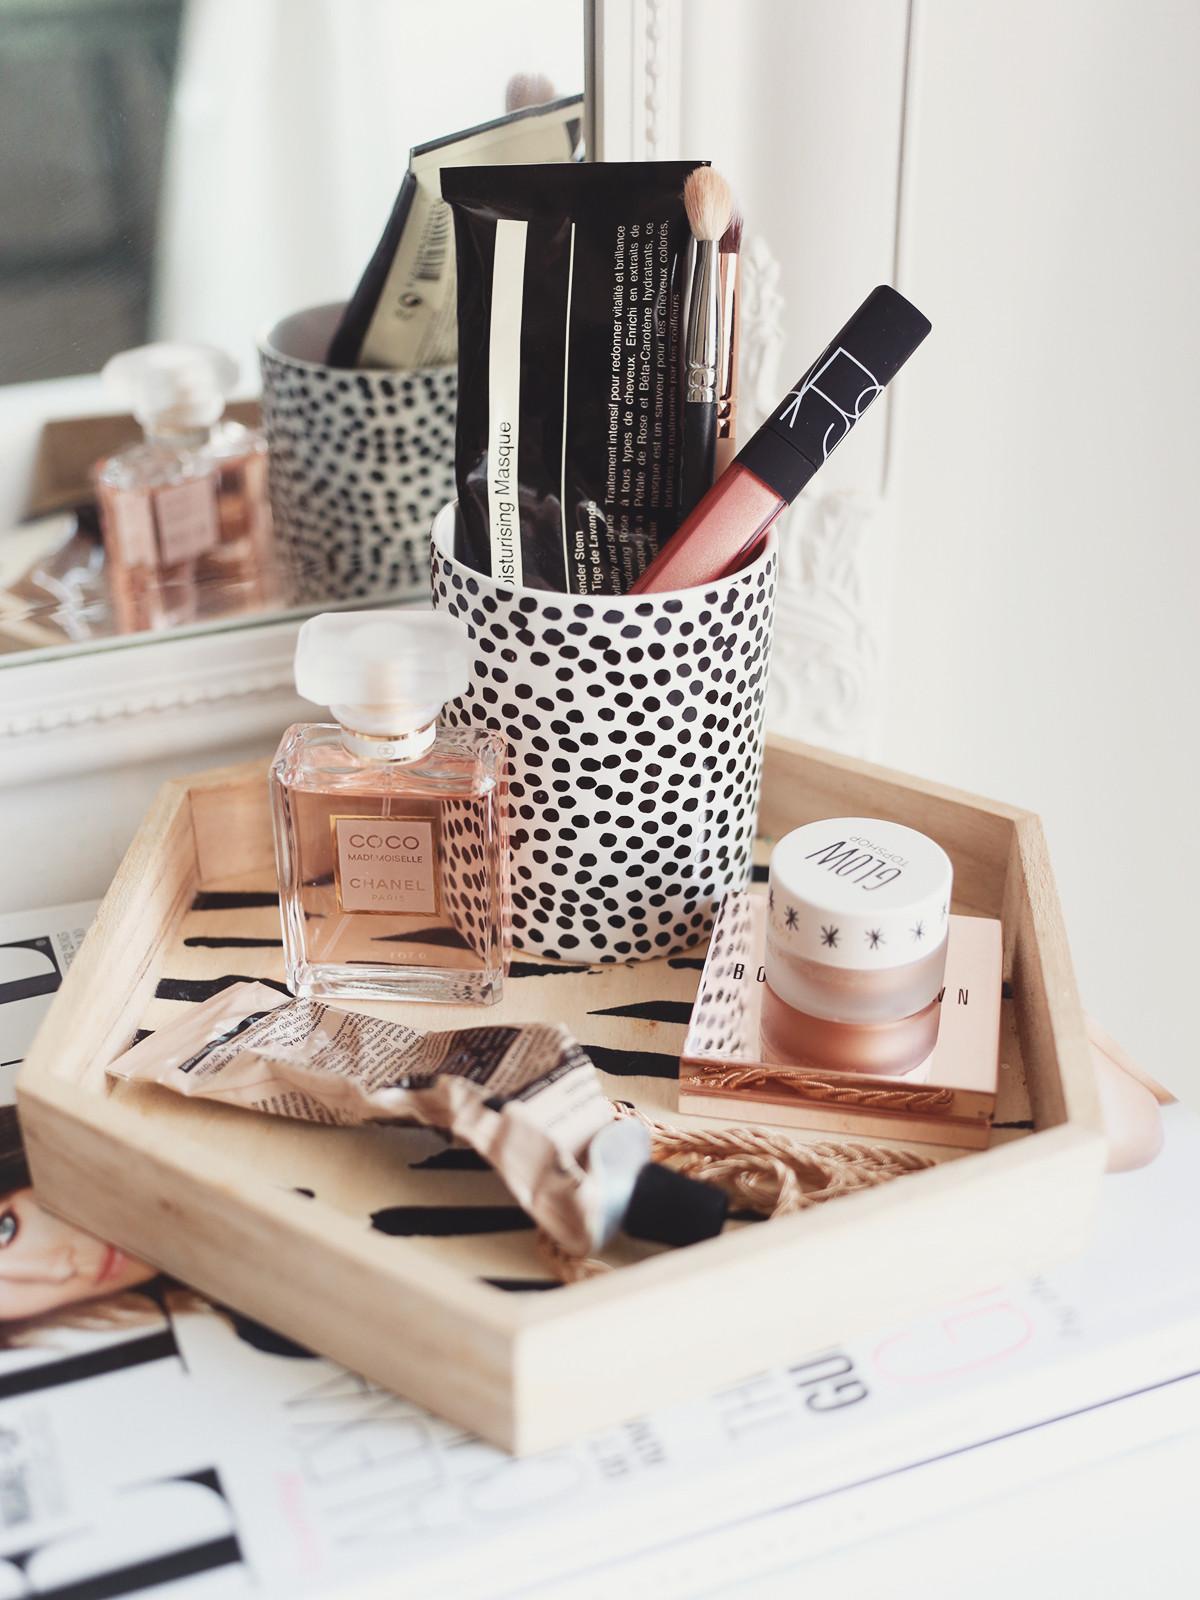 Make Up Organizer Diy  10 Easy DIY Makeup Organizer Ideas You'll Want to Copy